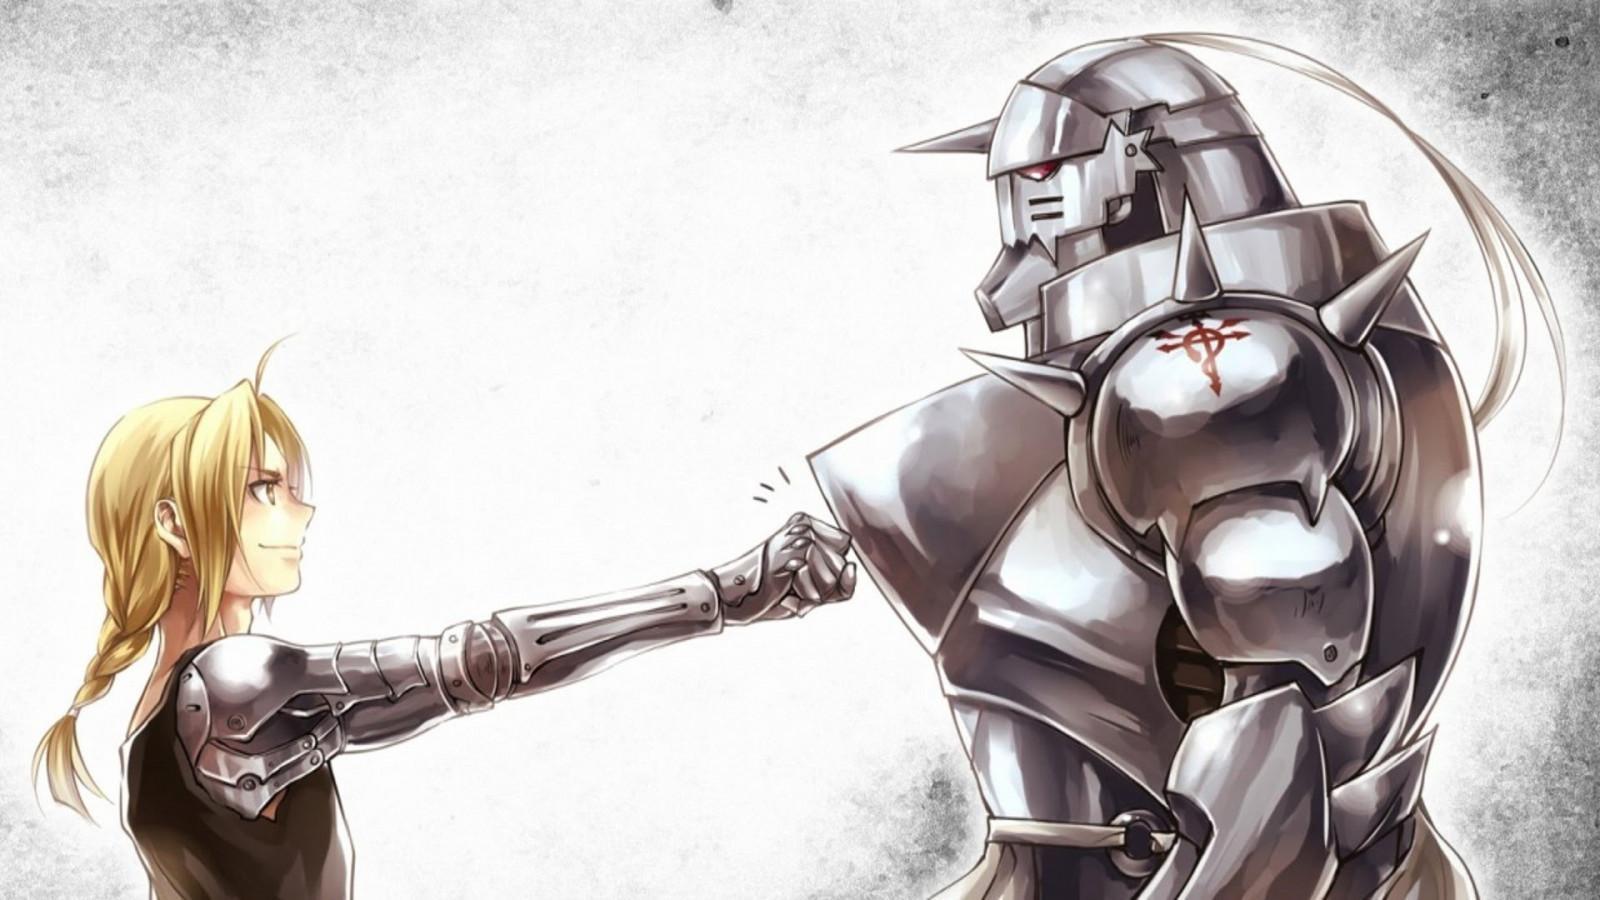 emotional anime lile Demon Slayer, Fullmetal Alchemist Brotherhood